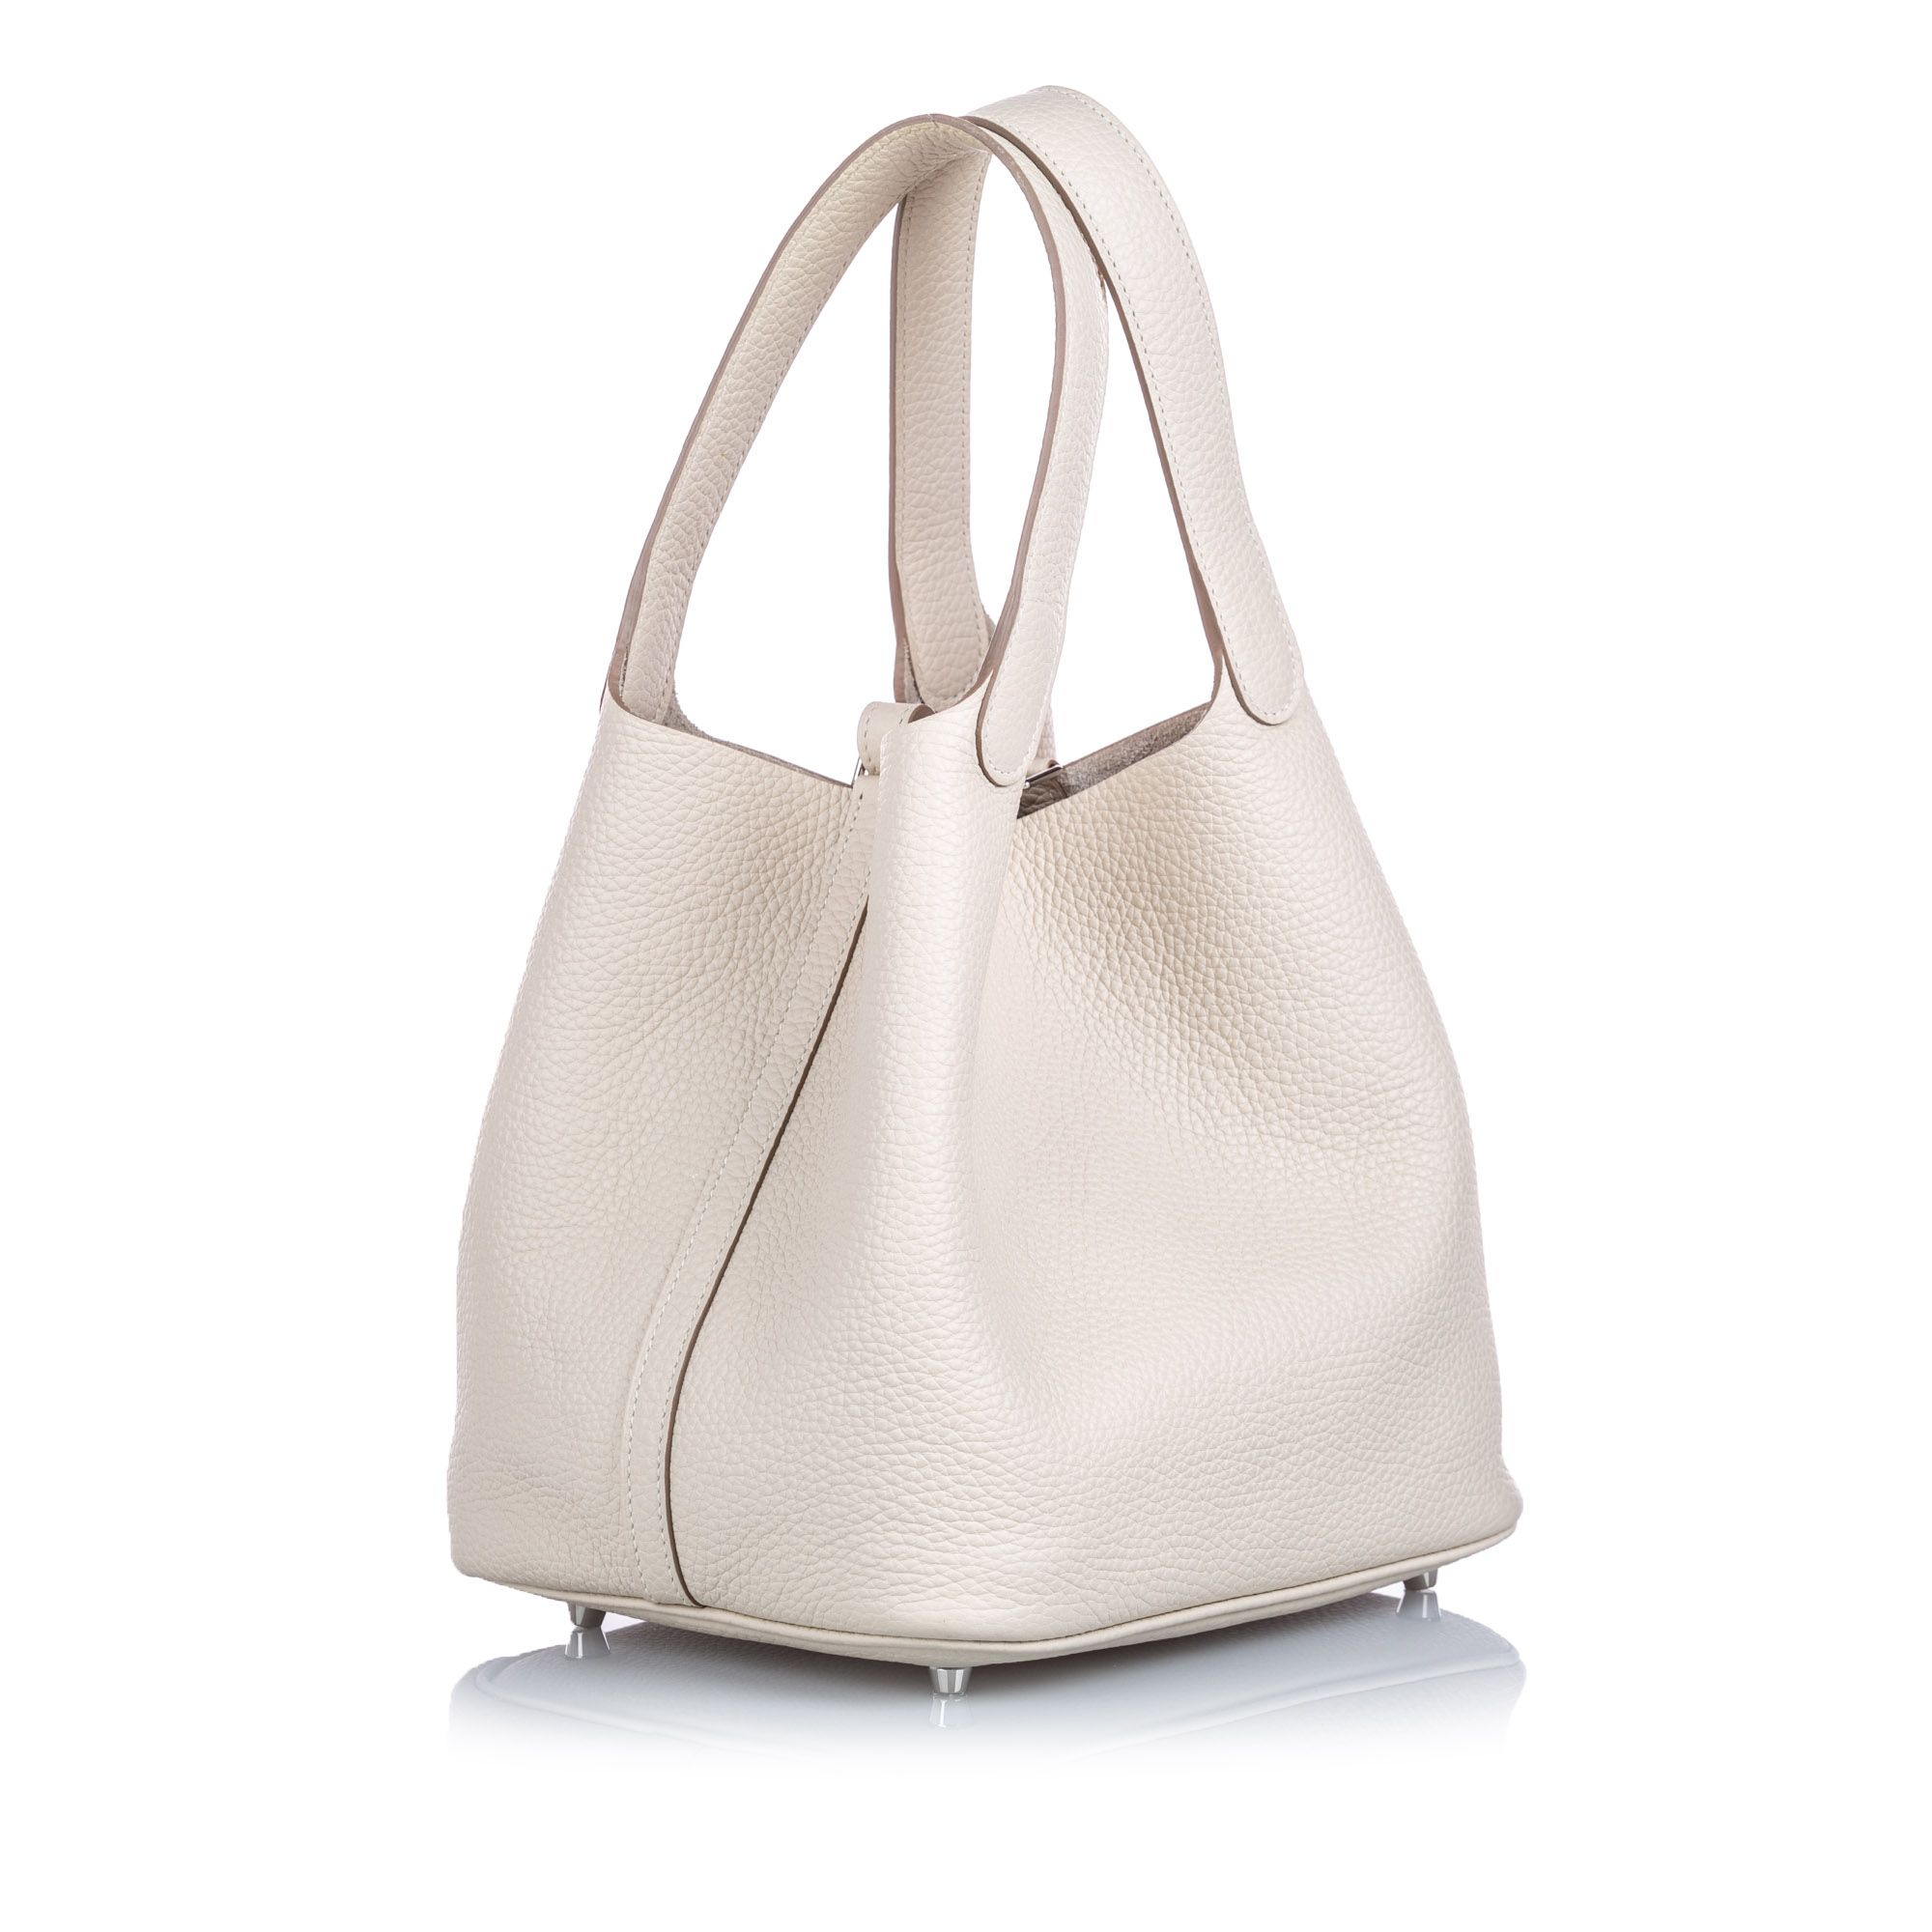 Vintage Hermes Clemence Picotin 22 White